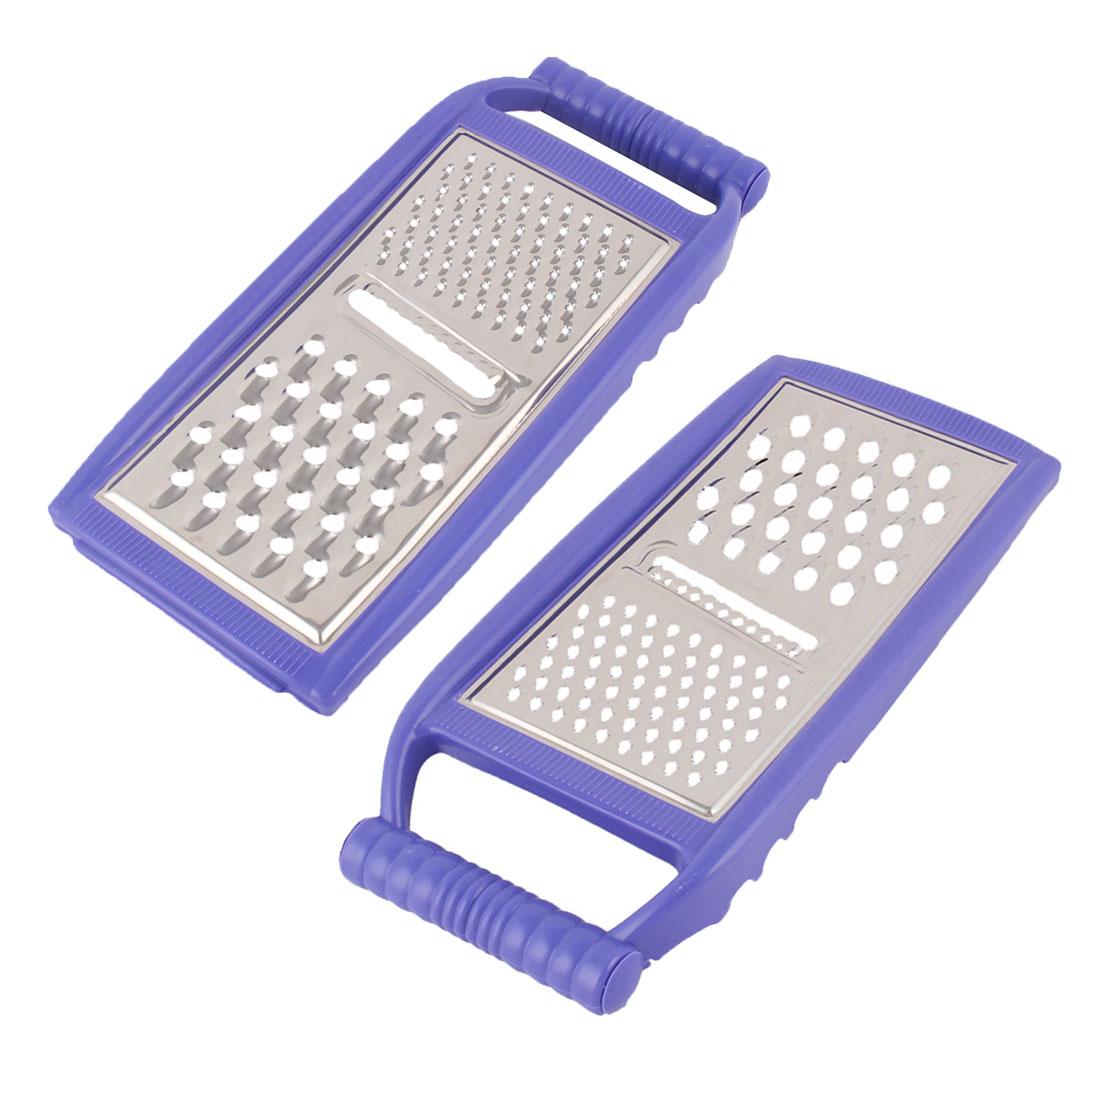 Kitchen Plastic Frame Radish Grater Peeler Cooking Tool Blue Silver Tone 2pcs